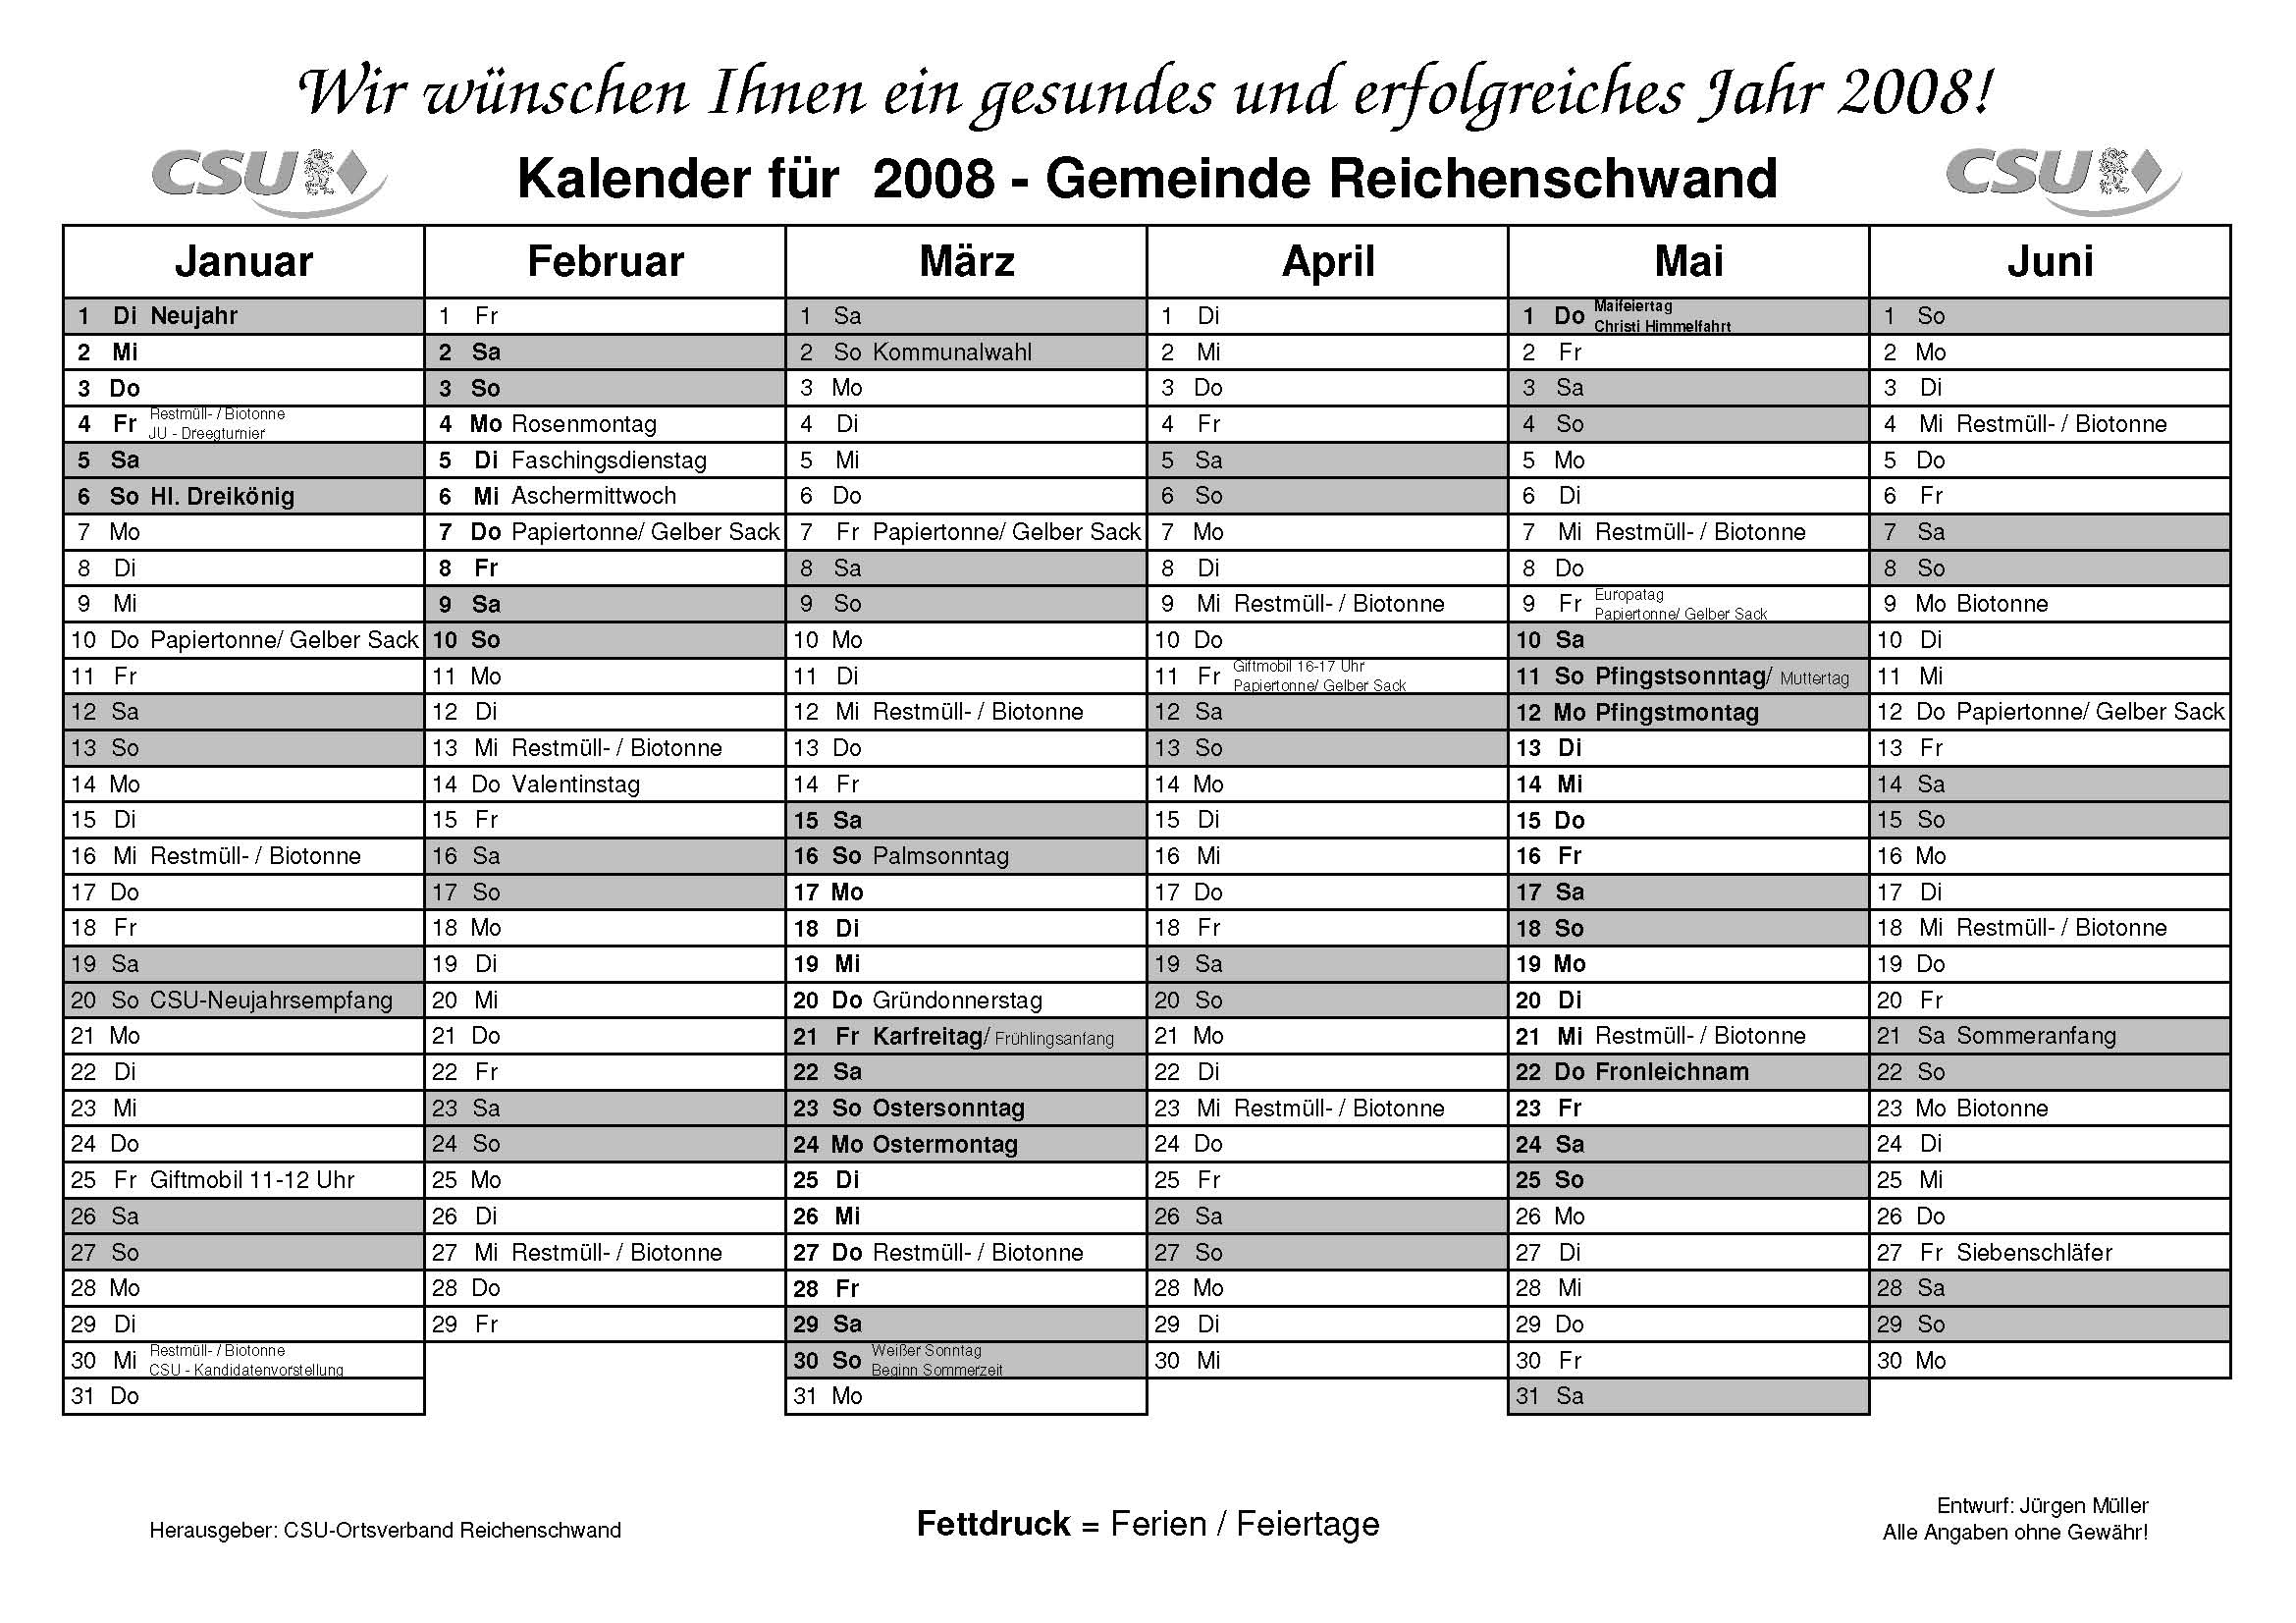 Teamup Calendar - Free shared online